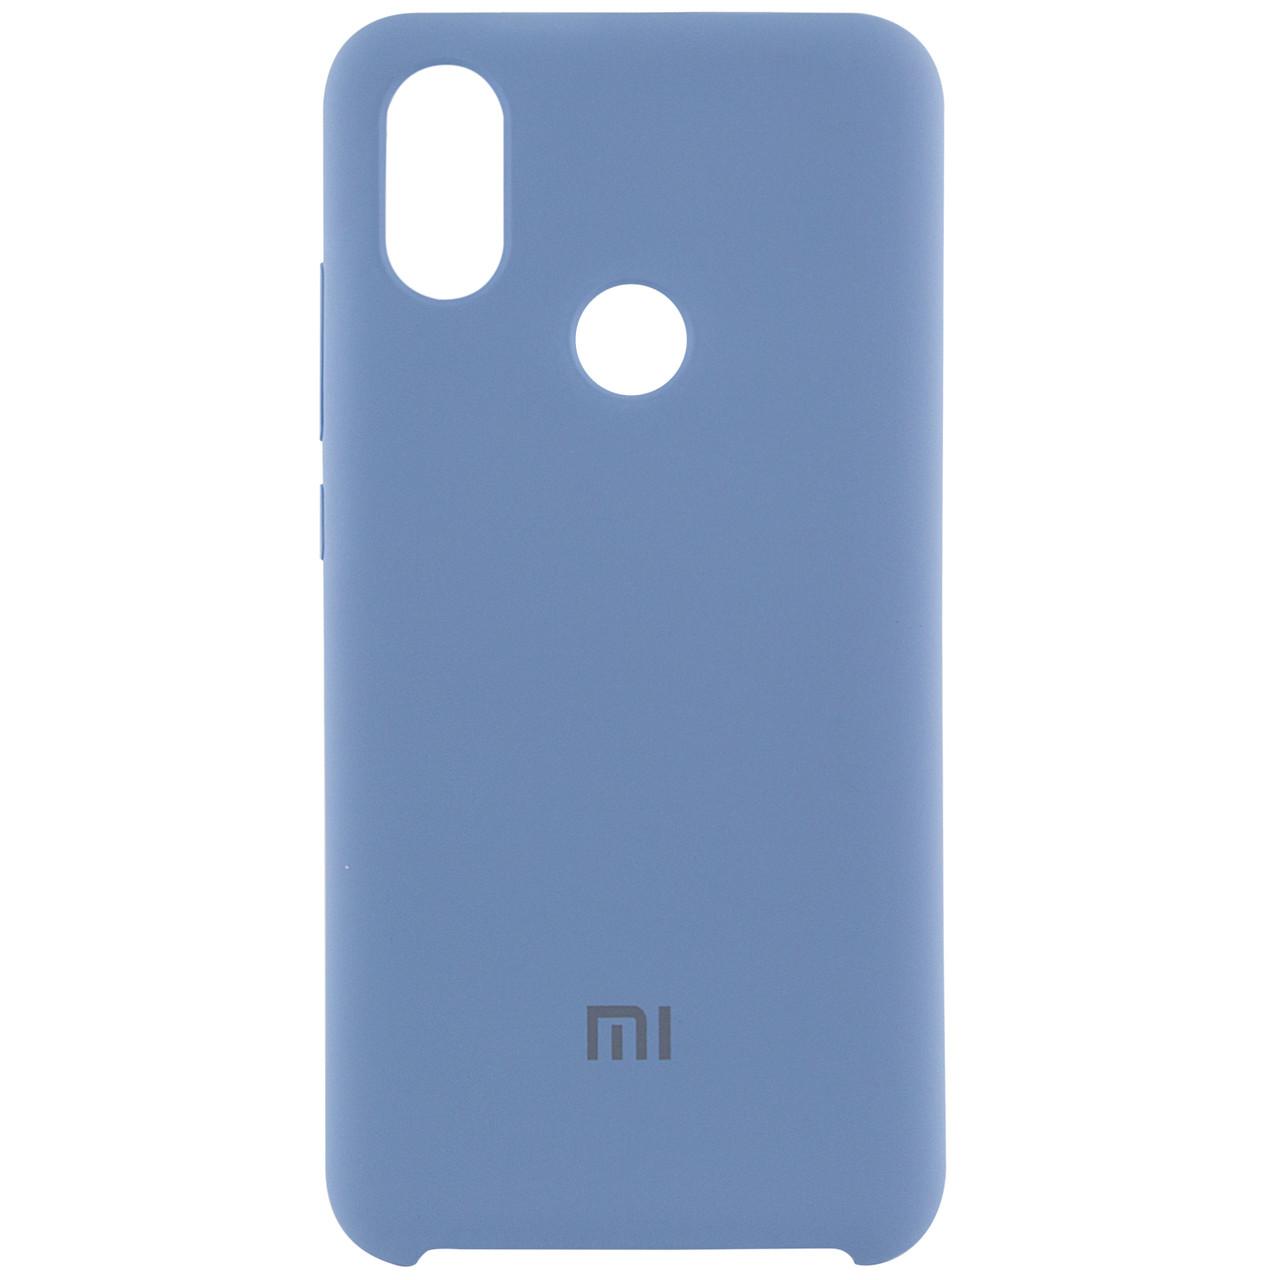 Чехол Silicone case для Xiaomi Mi 6X / Mi A2